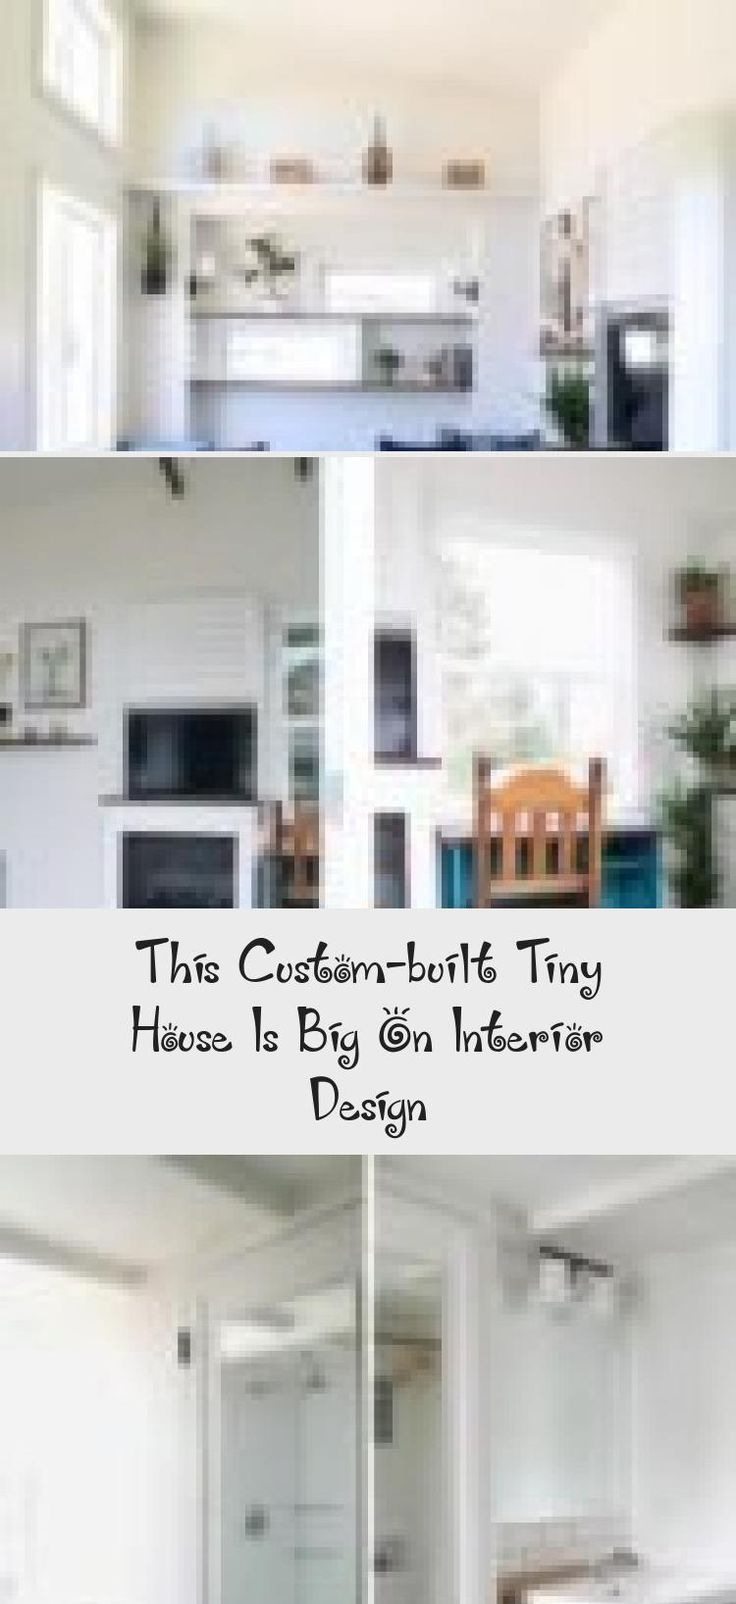 #designerinterior  #interiordesignOnABudget  #interiordesignInteriorismo  #interiordesignScandinavian  #interiordesignLogo  #interiordesignCozy #custom-built #tiny  This custom-built tiny house is big on interior design